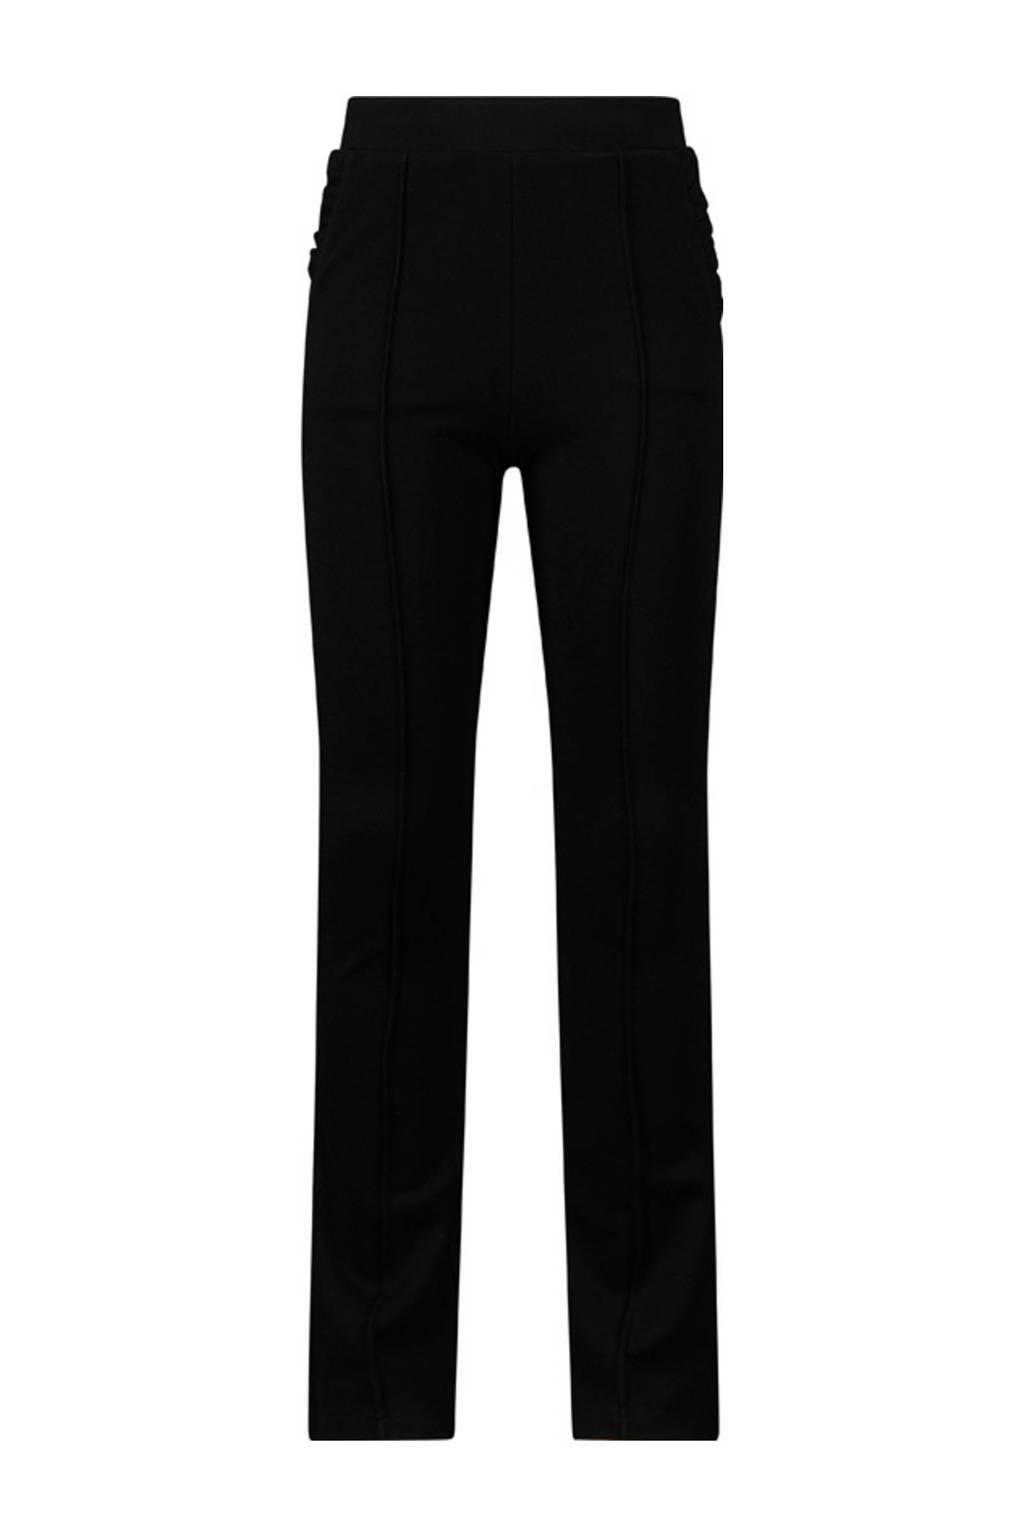 Retour Denim flared broek Fem zwart, Zwart